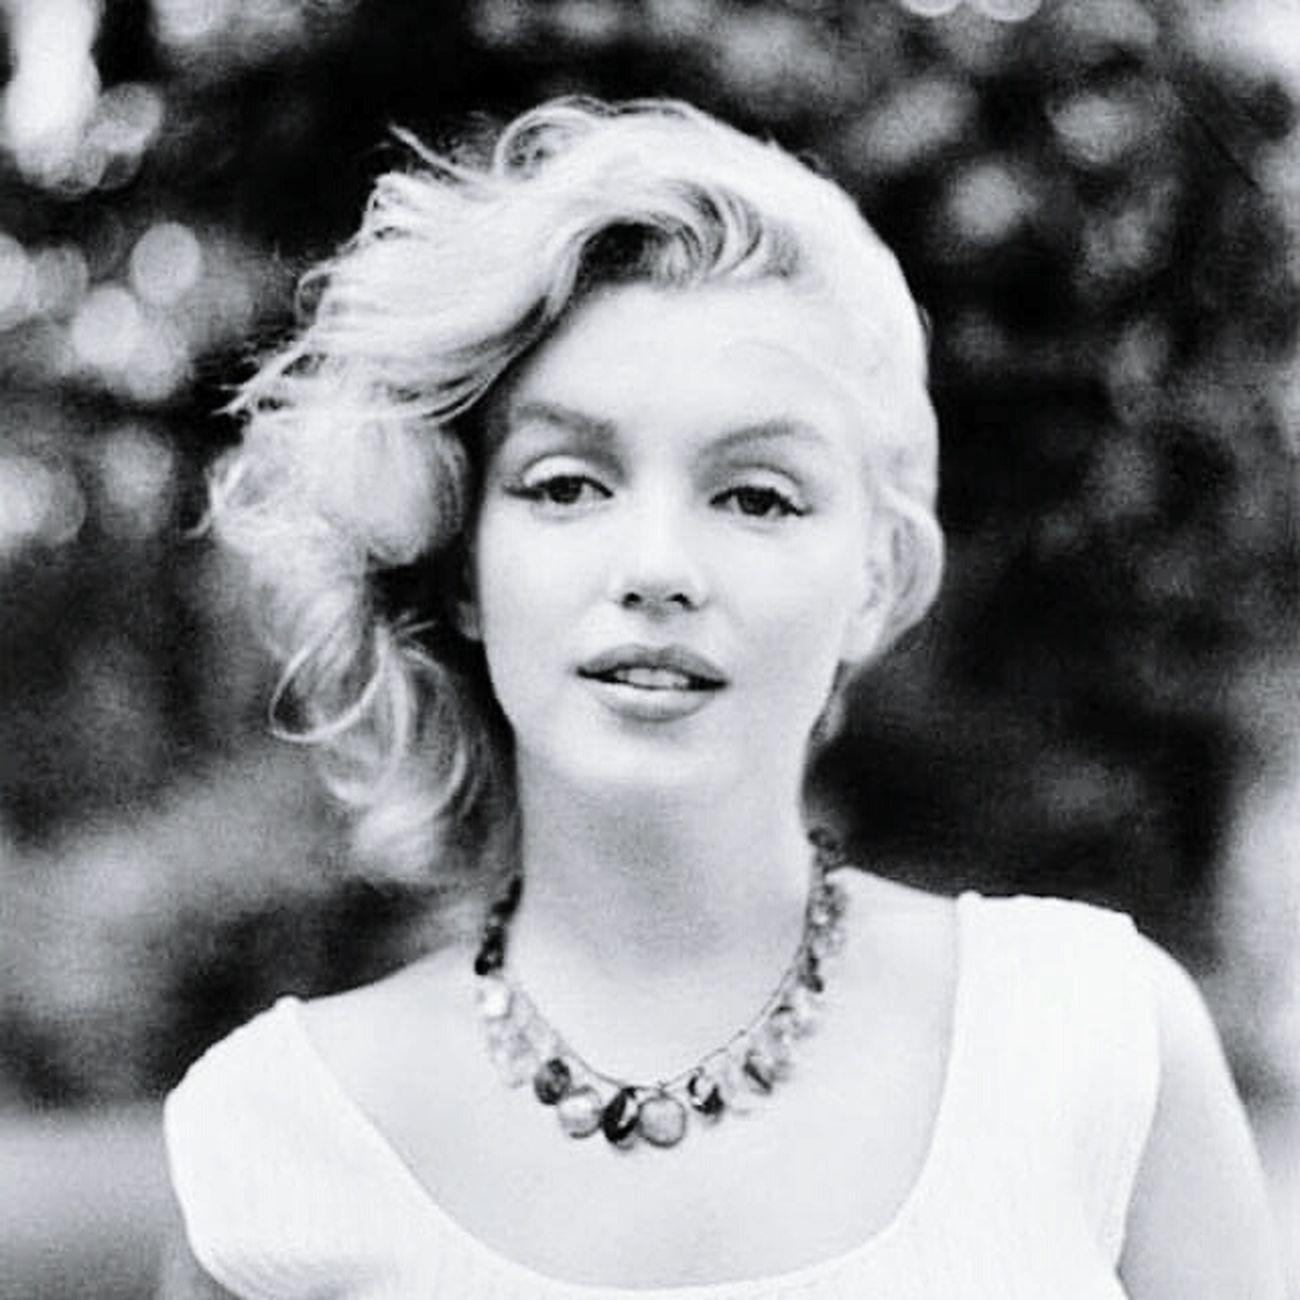 Marilyn Monroe Marilynmonroe MarilynMonroe♡ Normajeane Marilyn Monroe <3 Marilyn<3 Marilyn Norma Jeane